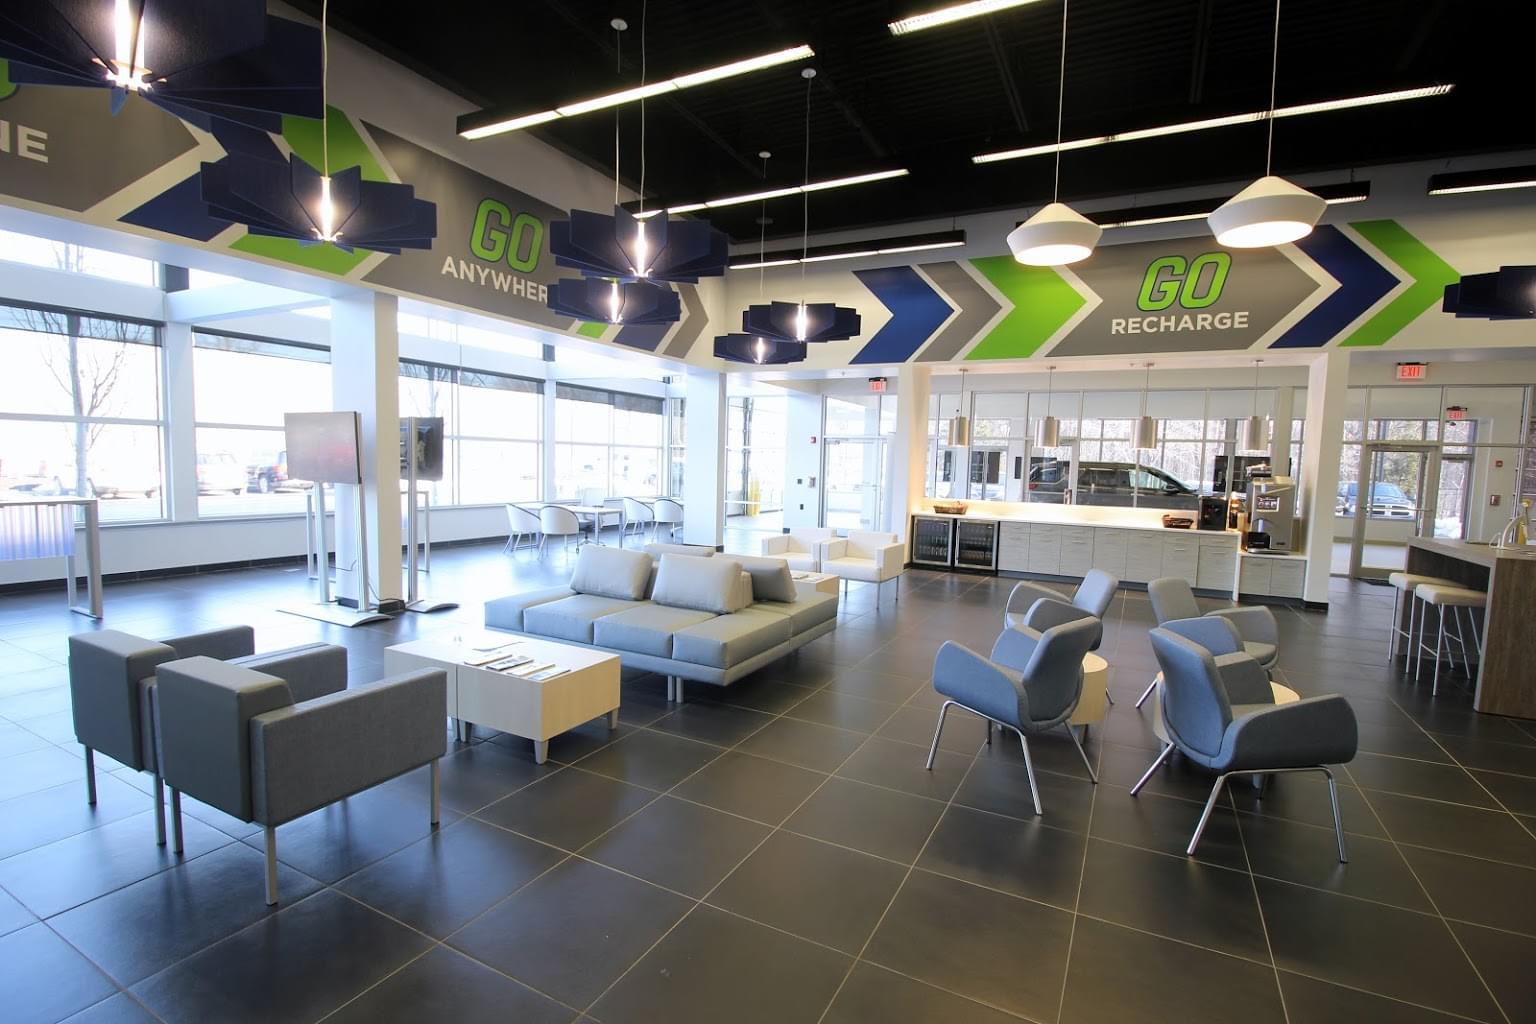 Holman GO Car dealership in Princeton, NJ showroom